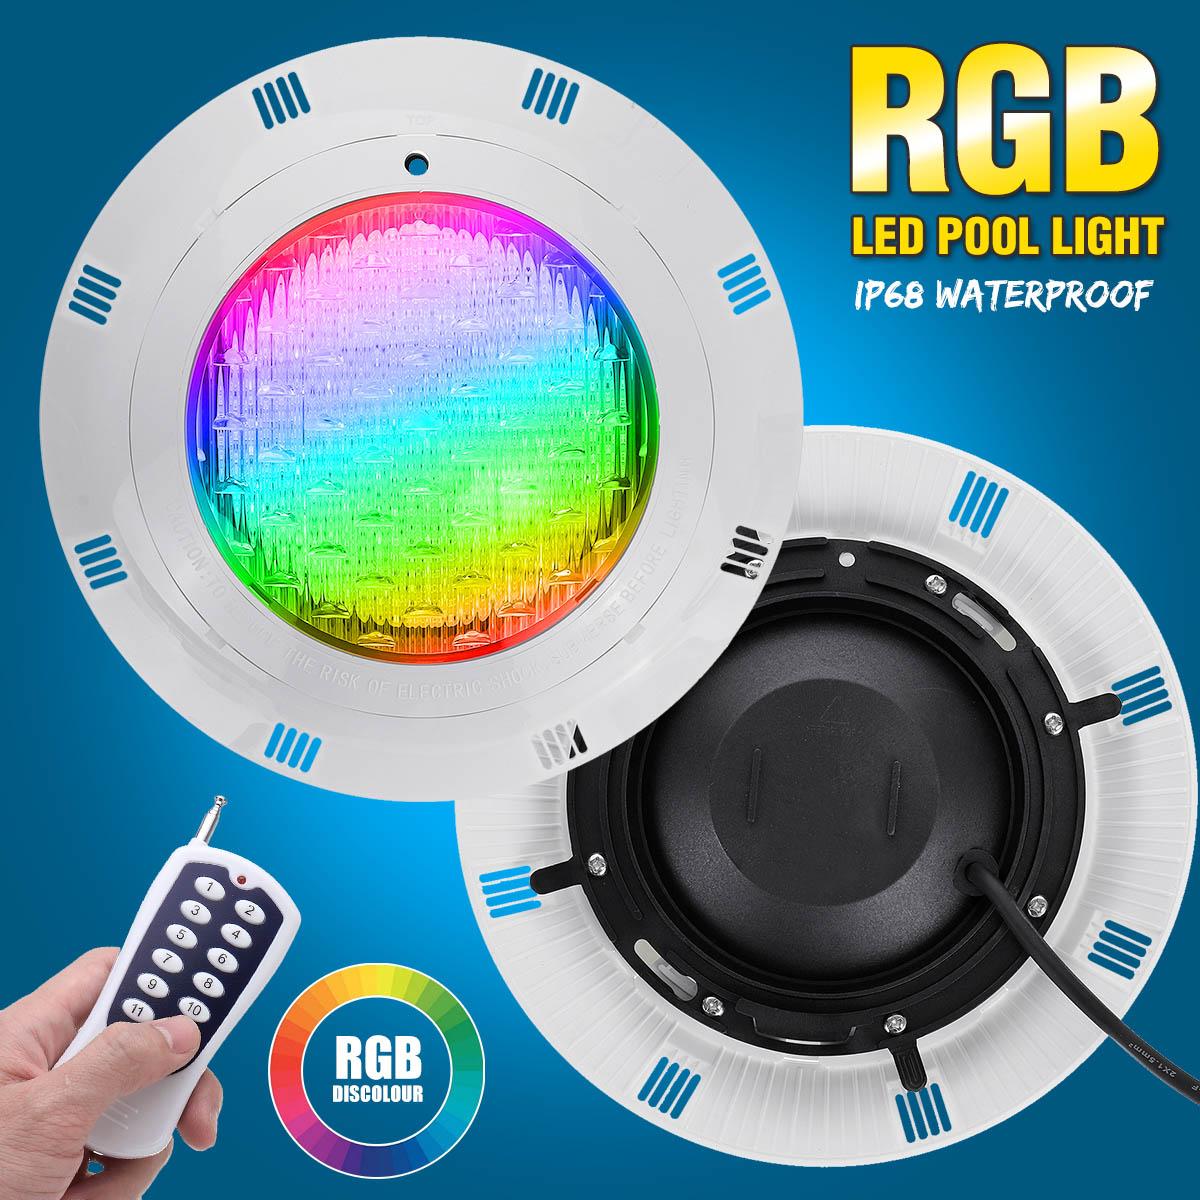 45W RGB Led בריכת אור 450LED IP68 עמיד למים AC/DC12V-24V חיצוני RGB מתחת למים אור בריכת Led הפיסינה לוז זרקור